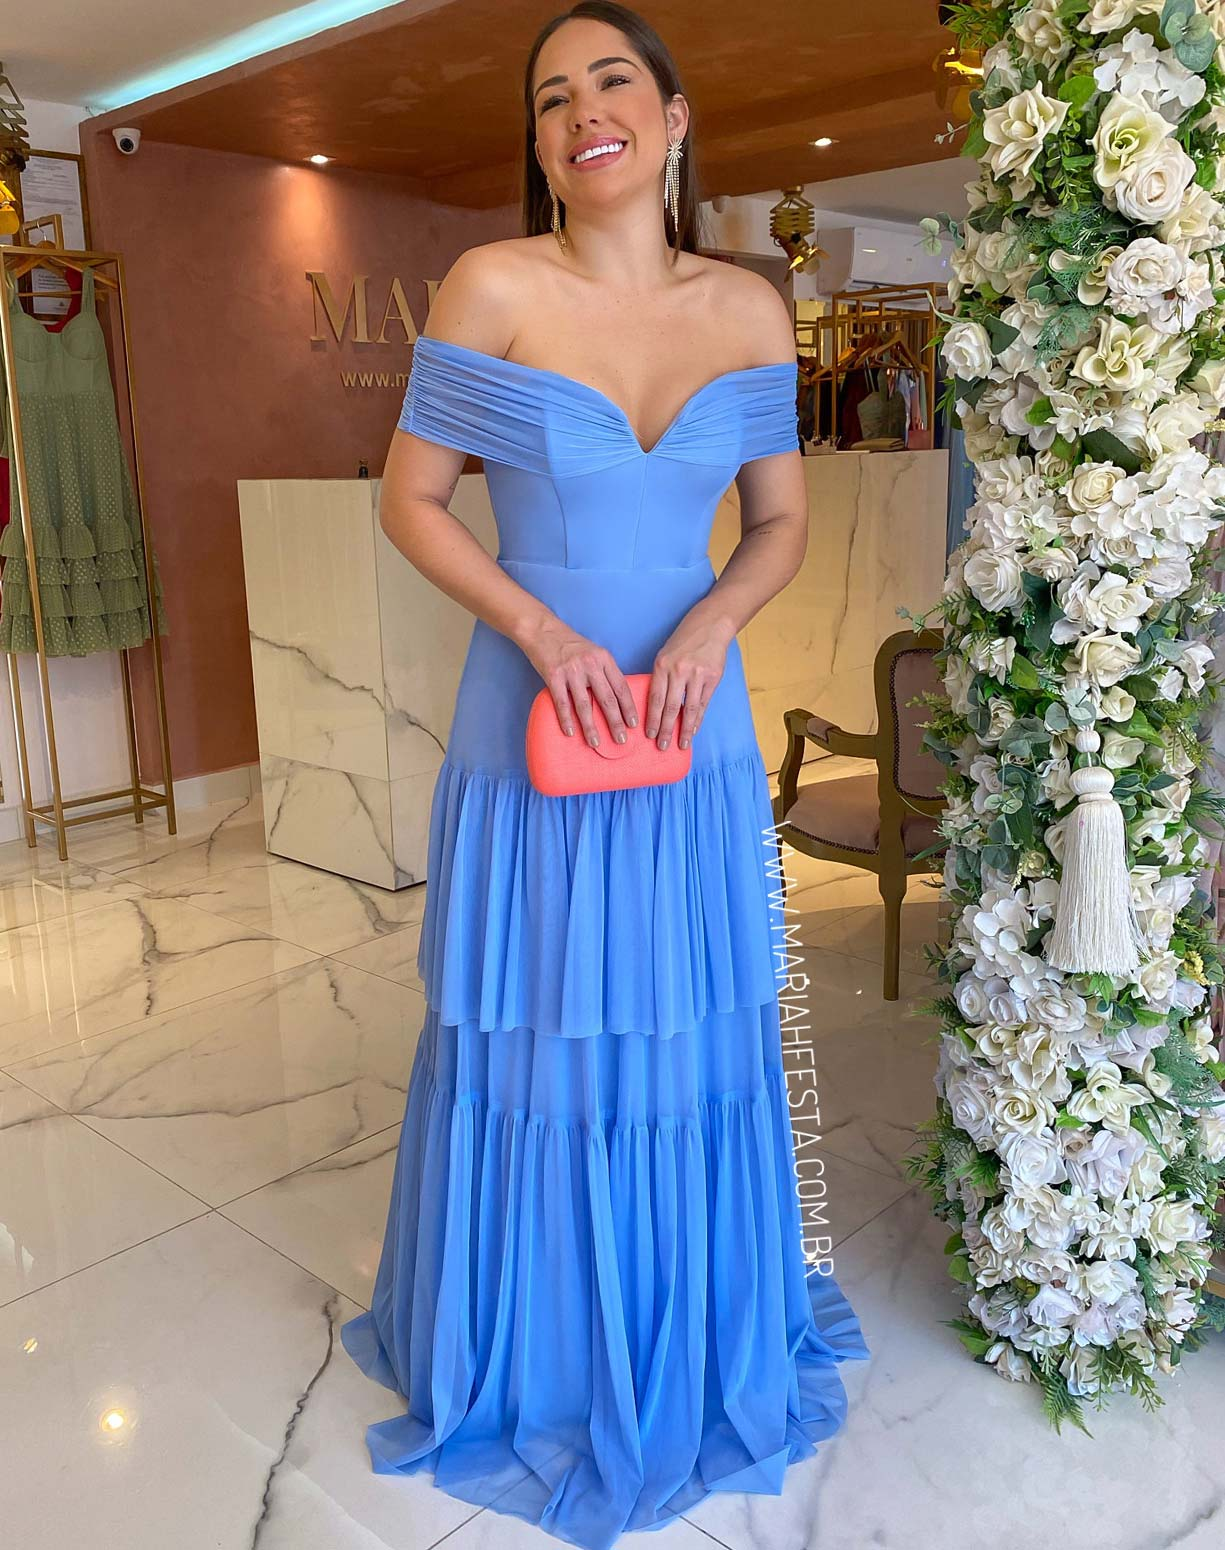 Vestido Azul Serenity em Tule com Decote Ombro a Ombro